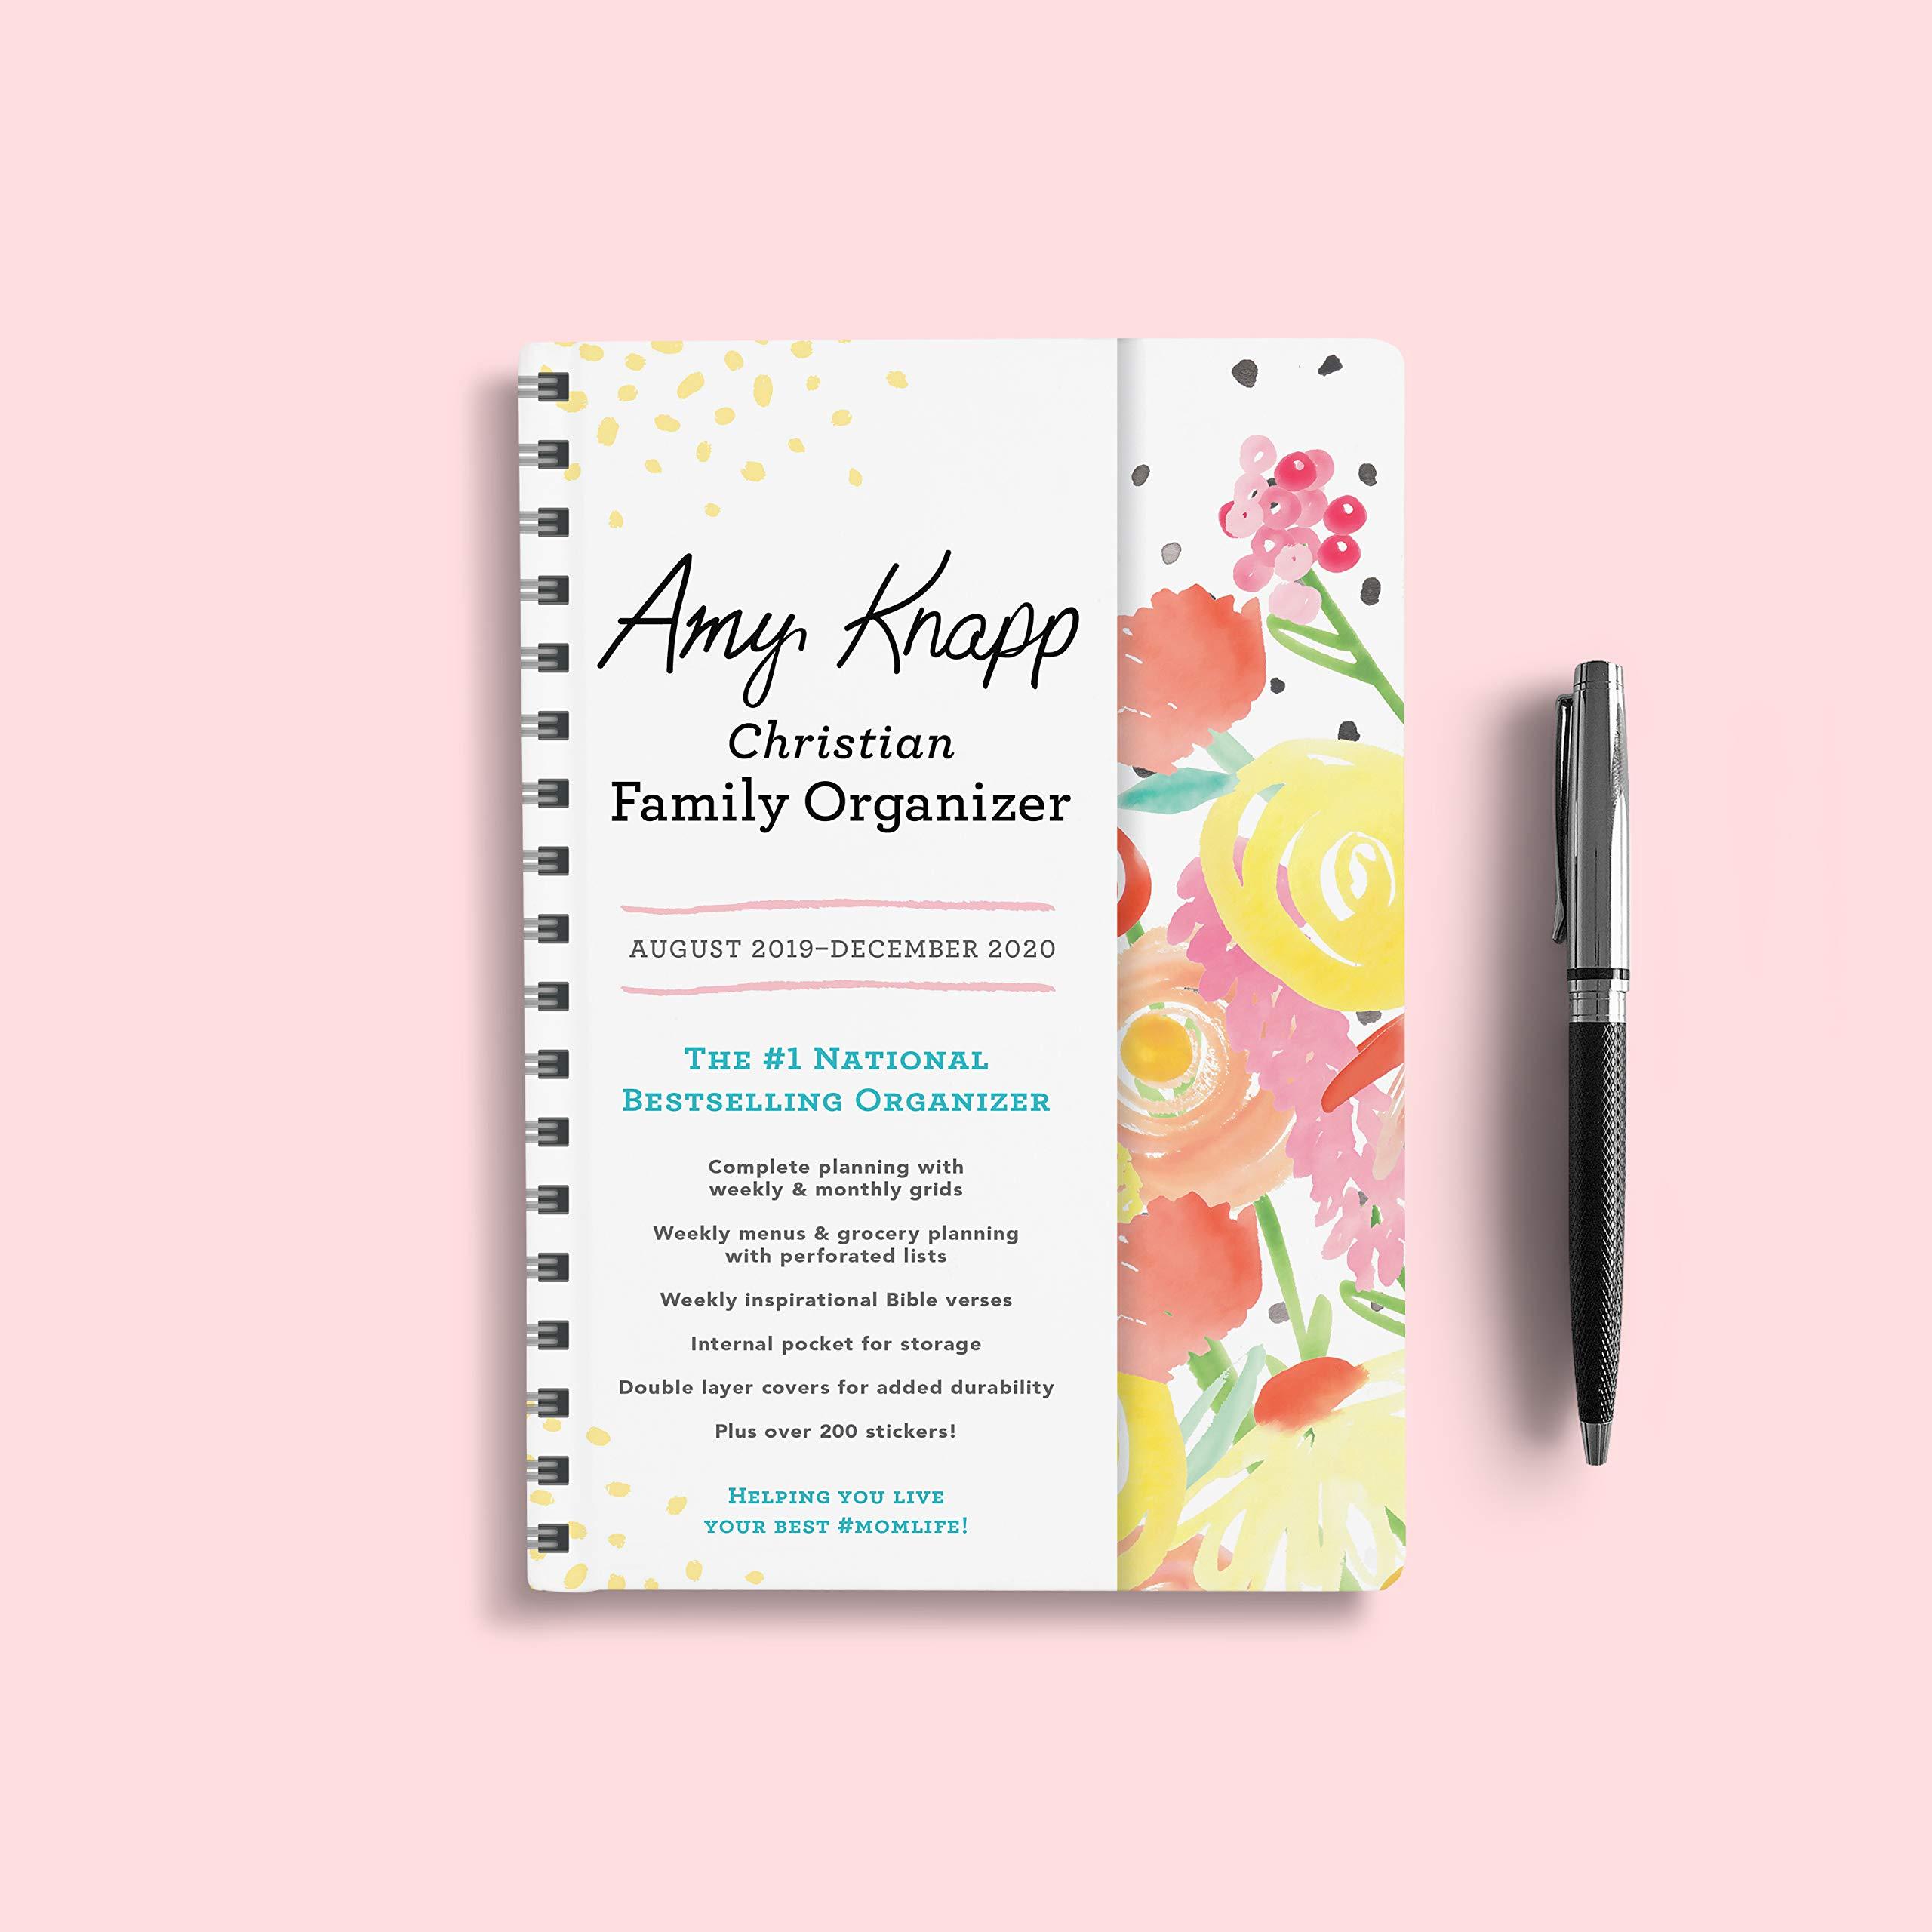 Chrisitan Concert Calendar December 2020 2020 Amy Knapp's Christian Family Organizer: August 2019 December